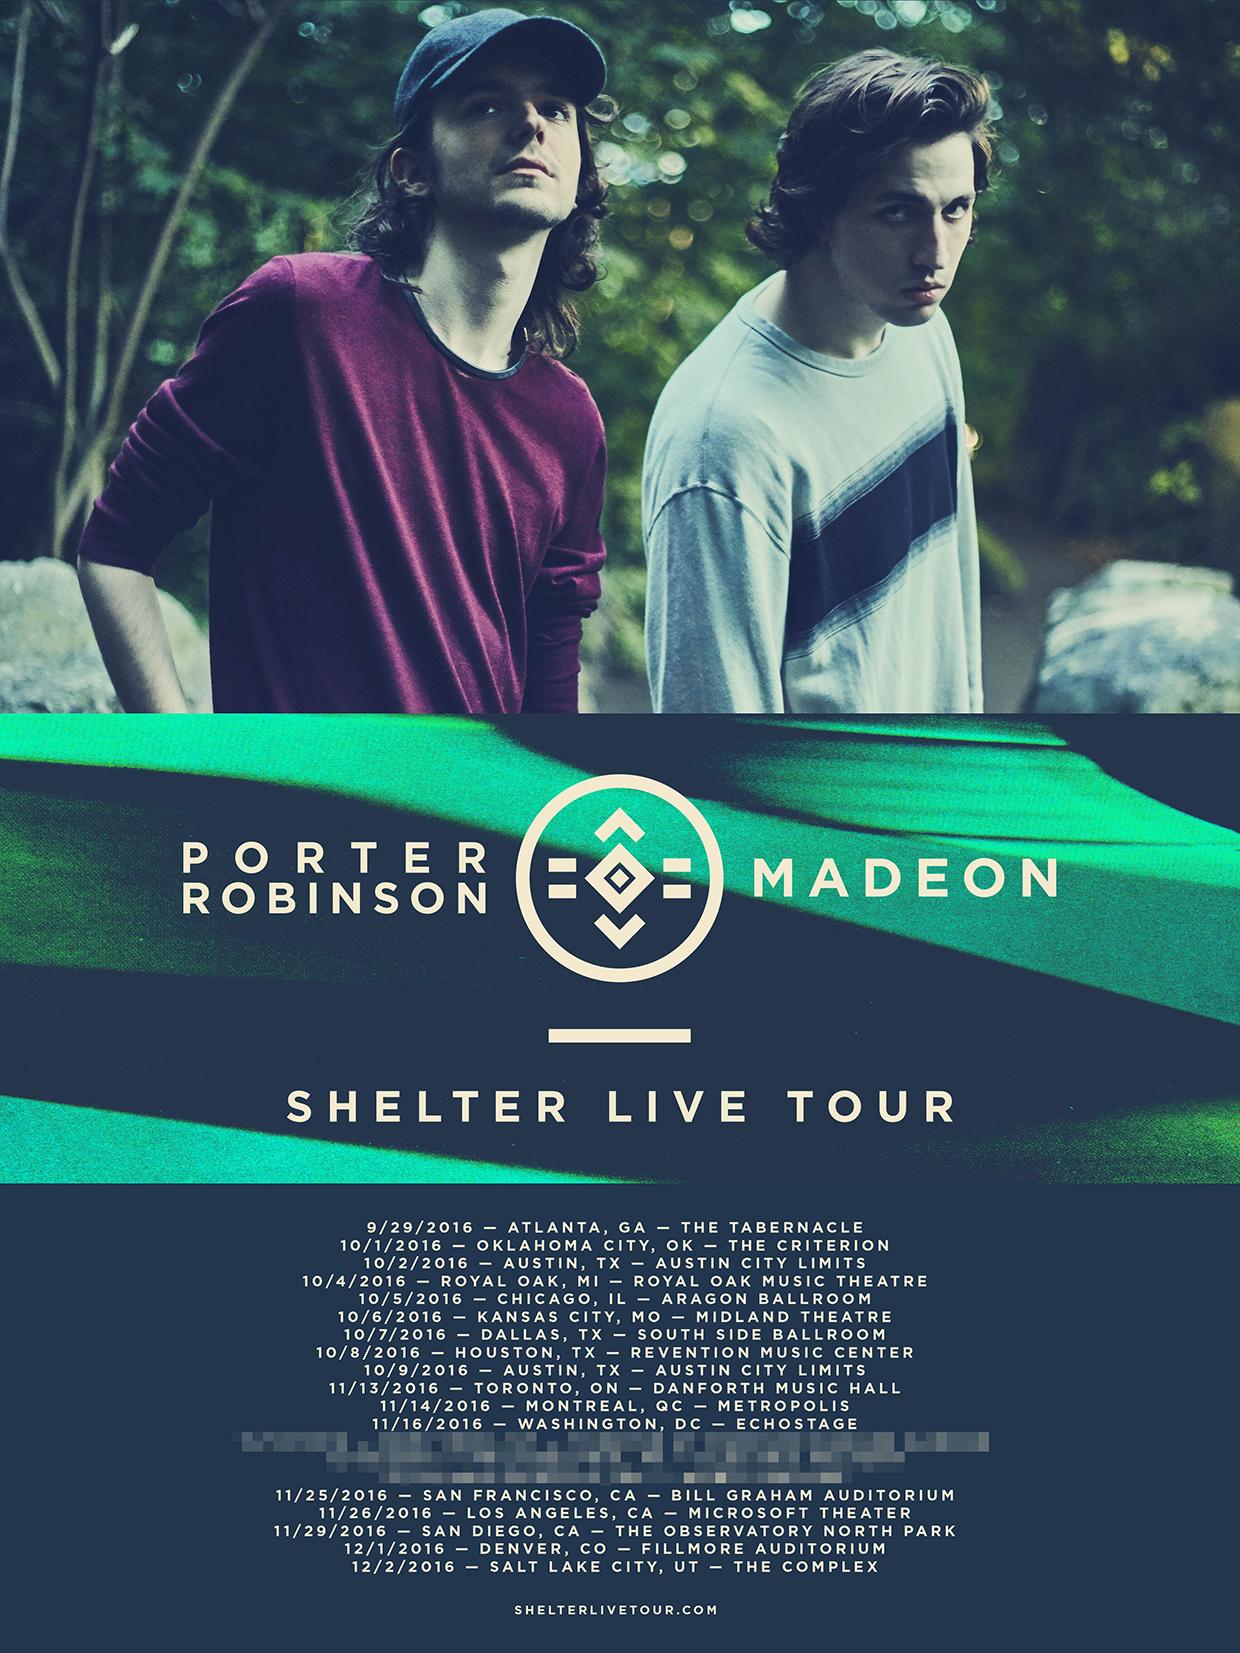 Madeon-Porter-Robinson-flyer-2016-billboard-1240